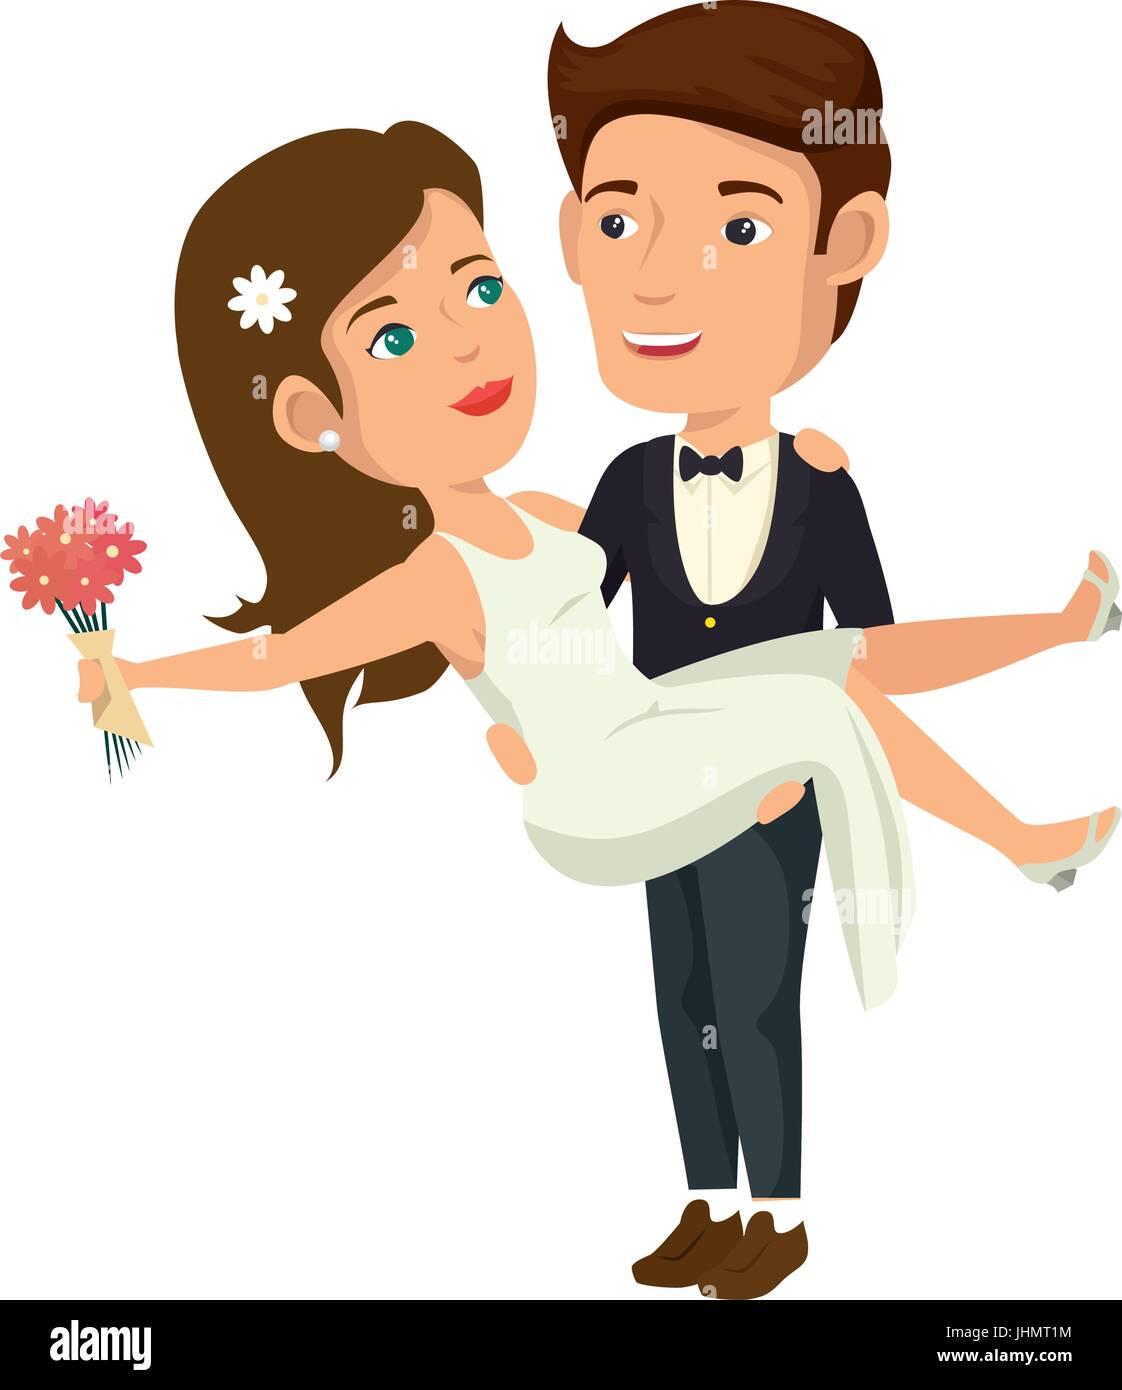 Cartoon Happy Wedding Couple Icon Over White Background